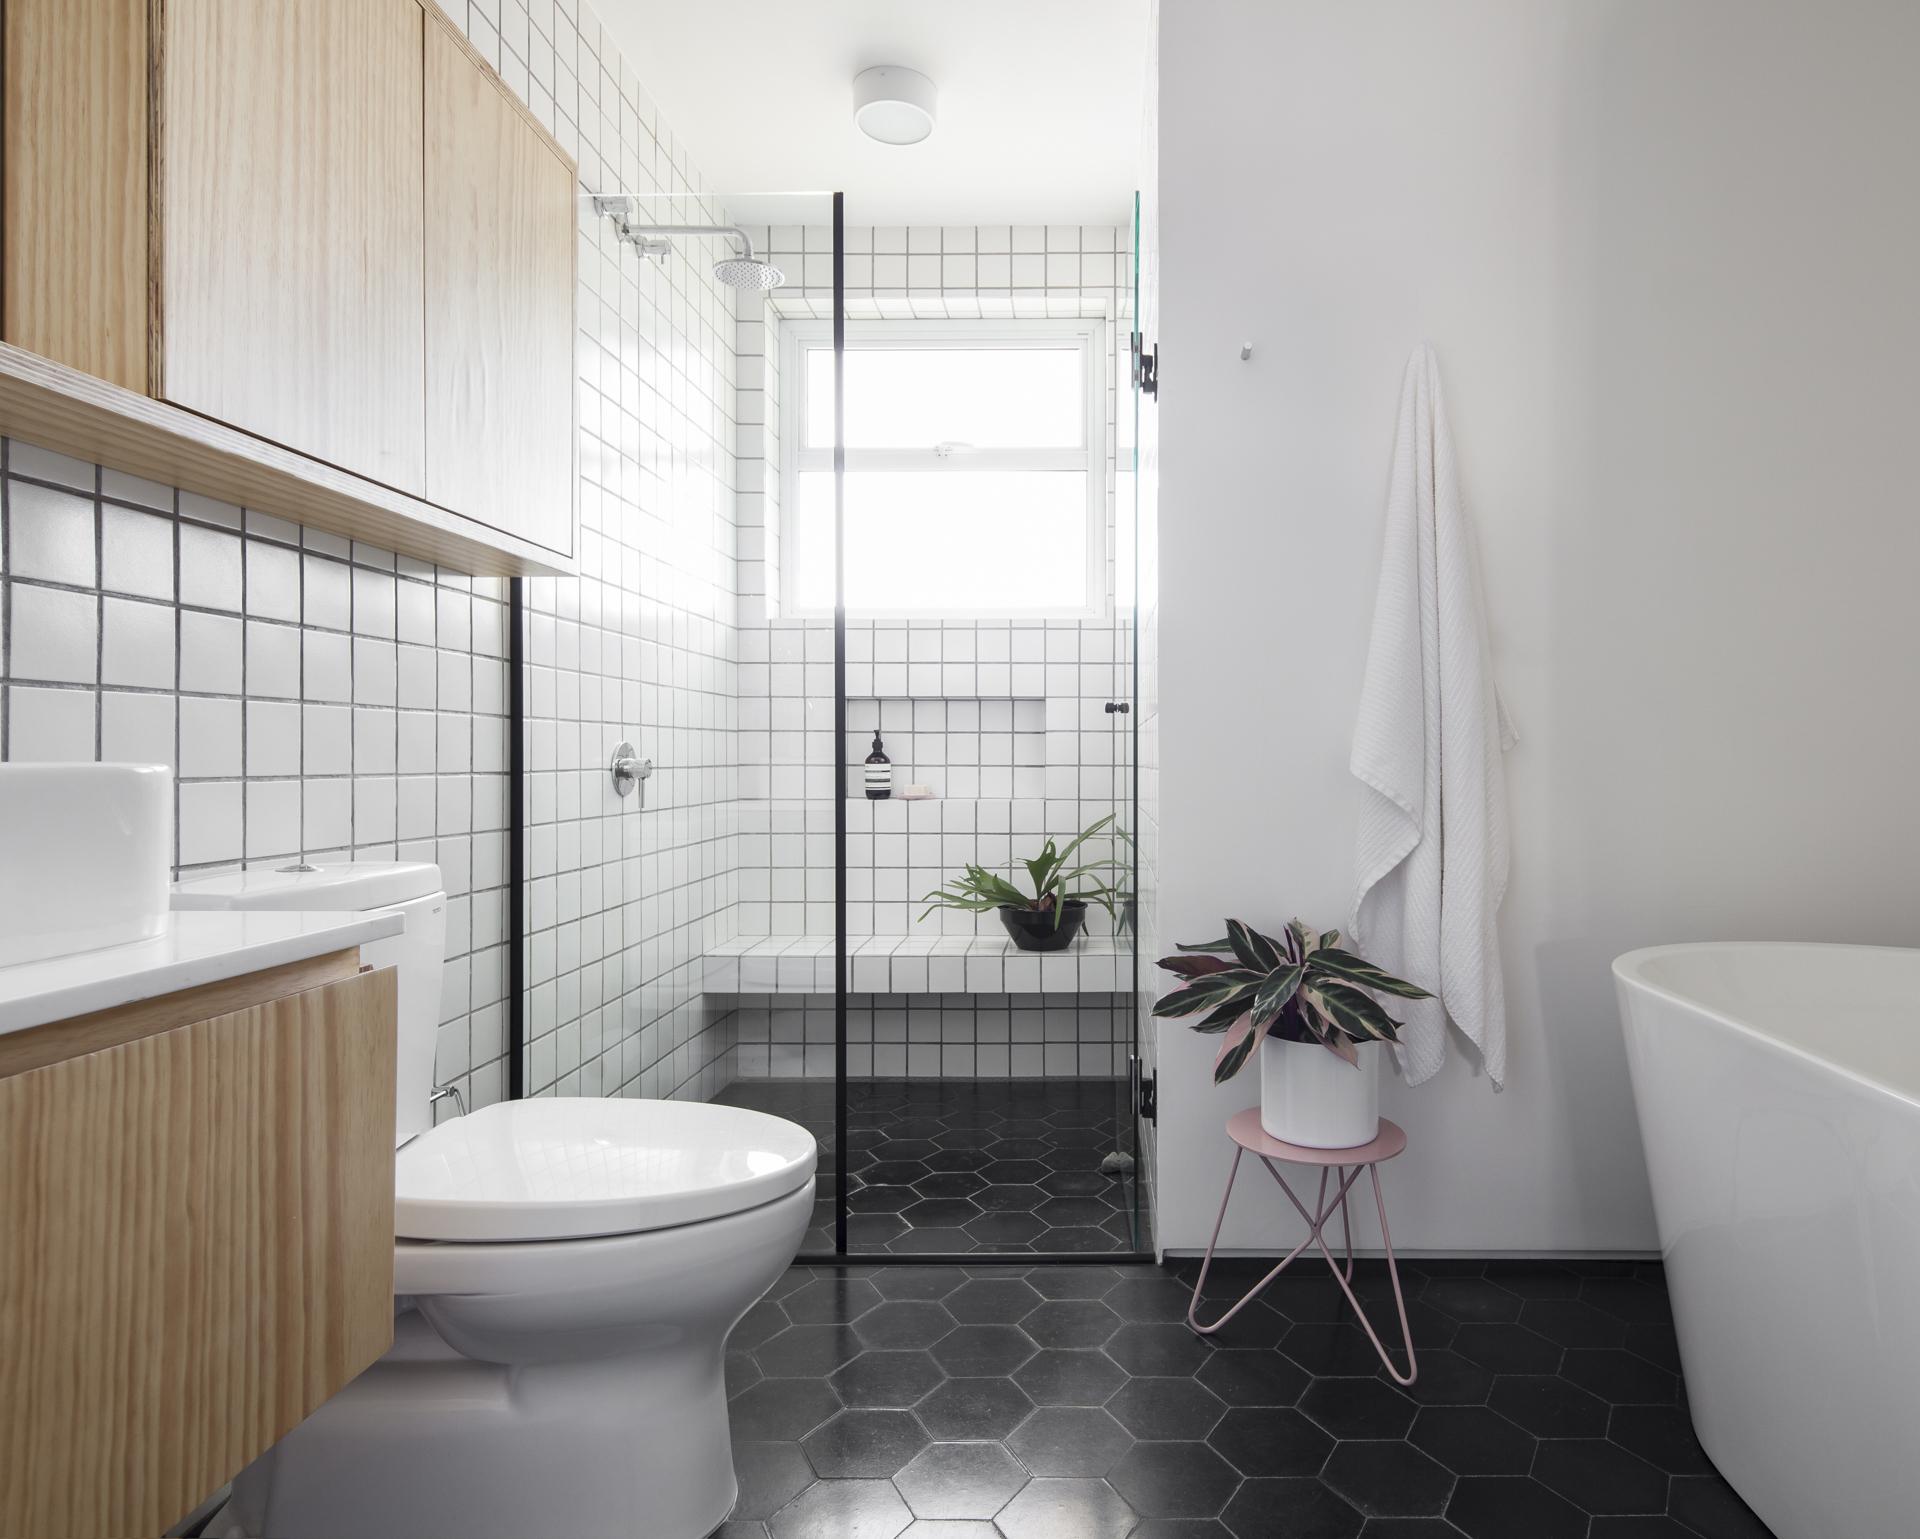 banhos rb - estudio nodo-1.jpg